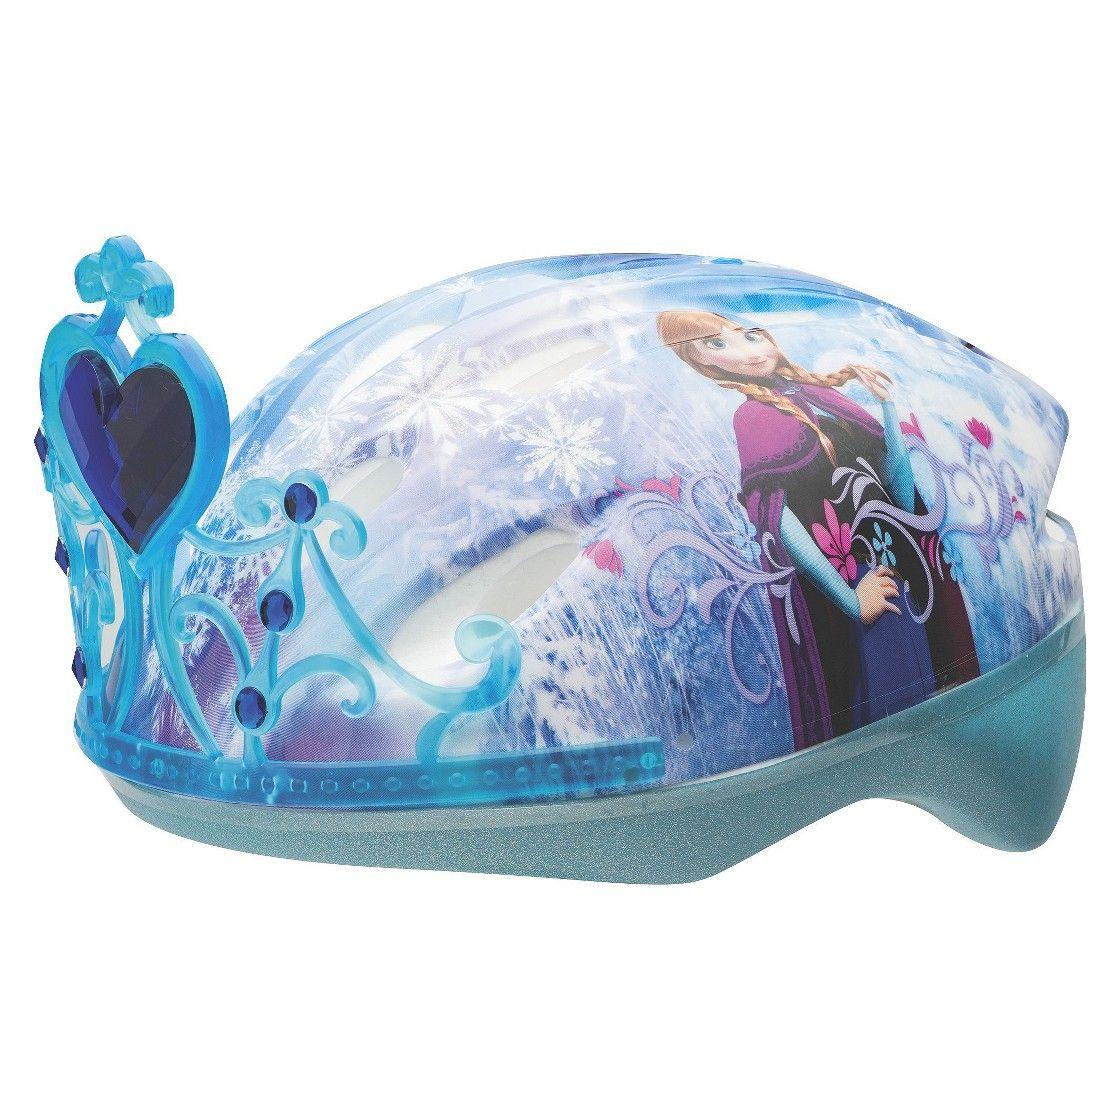 Frozen 3D Tiara Child Bike Helmet Frozen toys, Kids bike